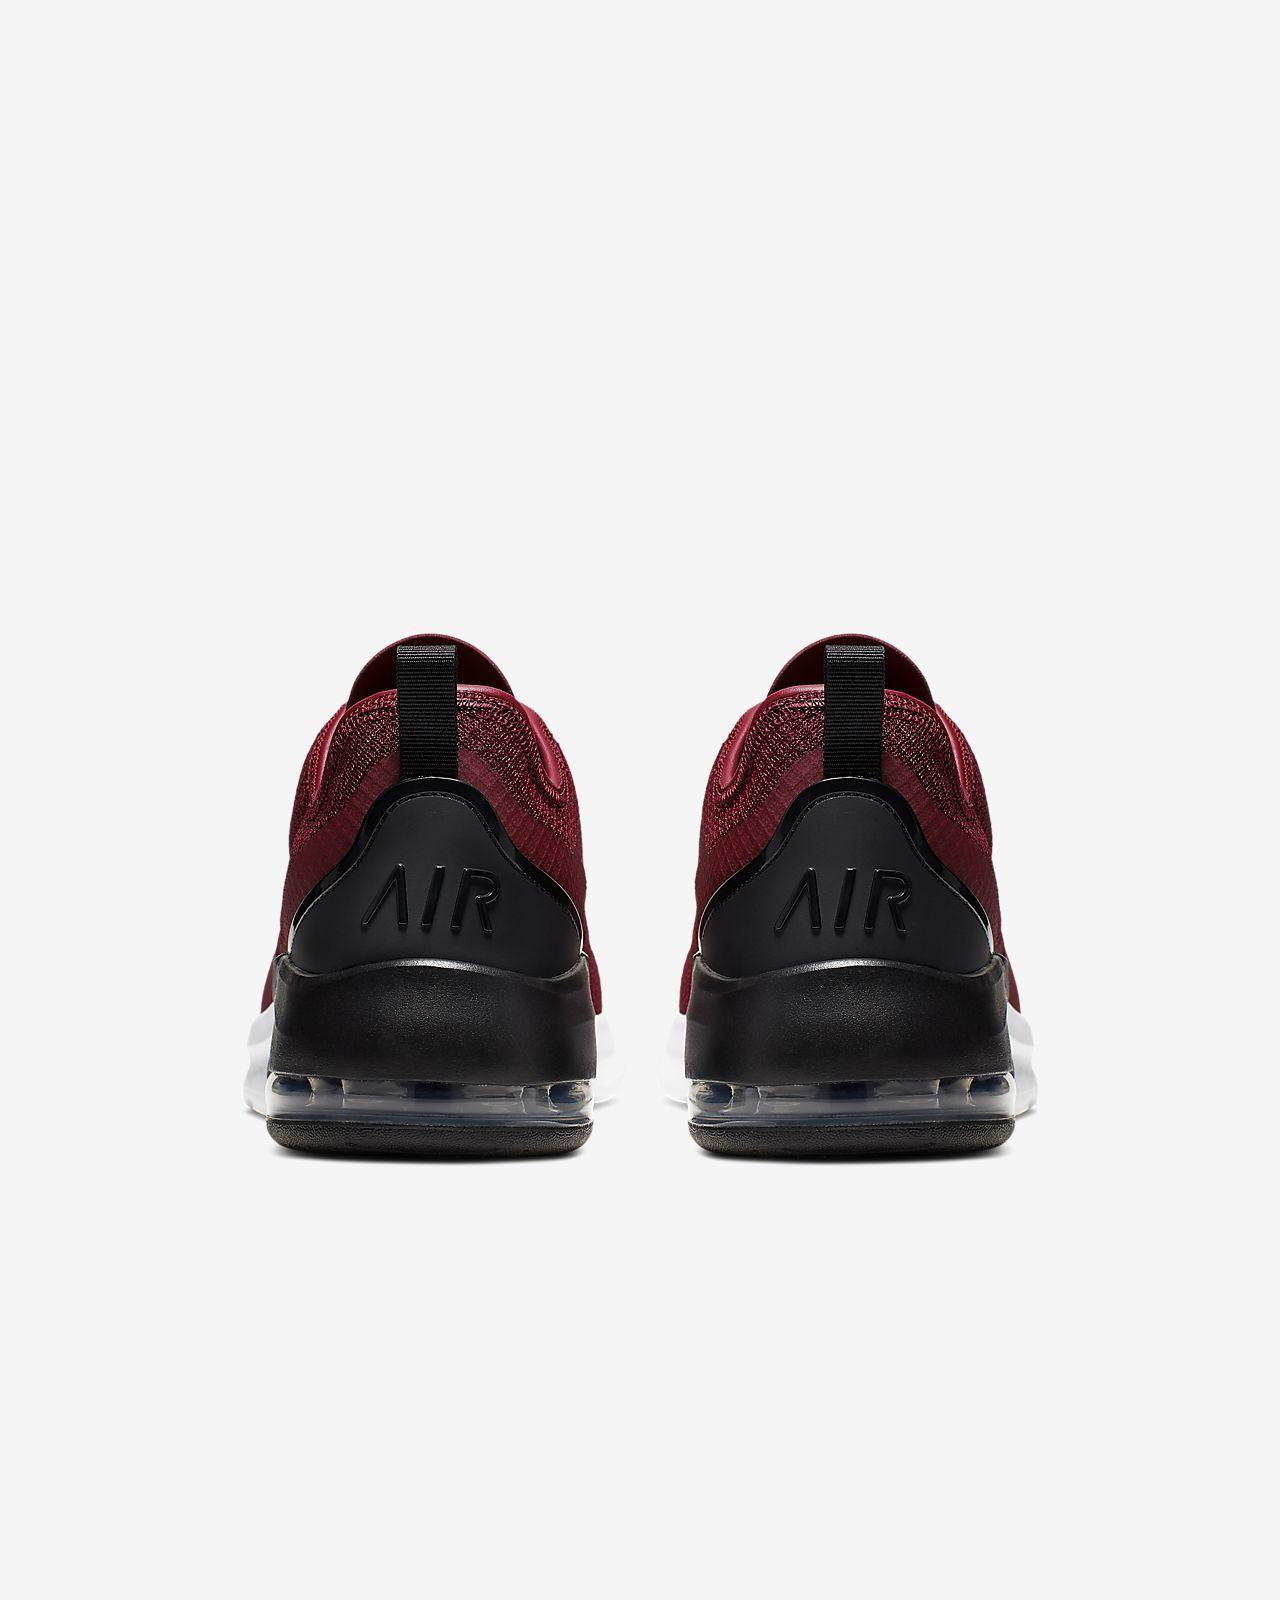 Nike Women's Air Max Motion 2 Shoe BlackRose GoldThunder Grey Size 7.5 M US